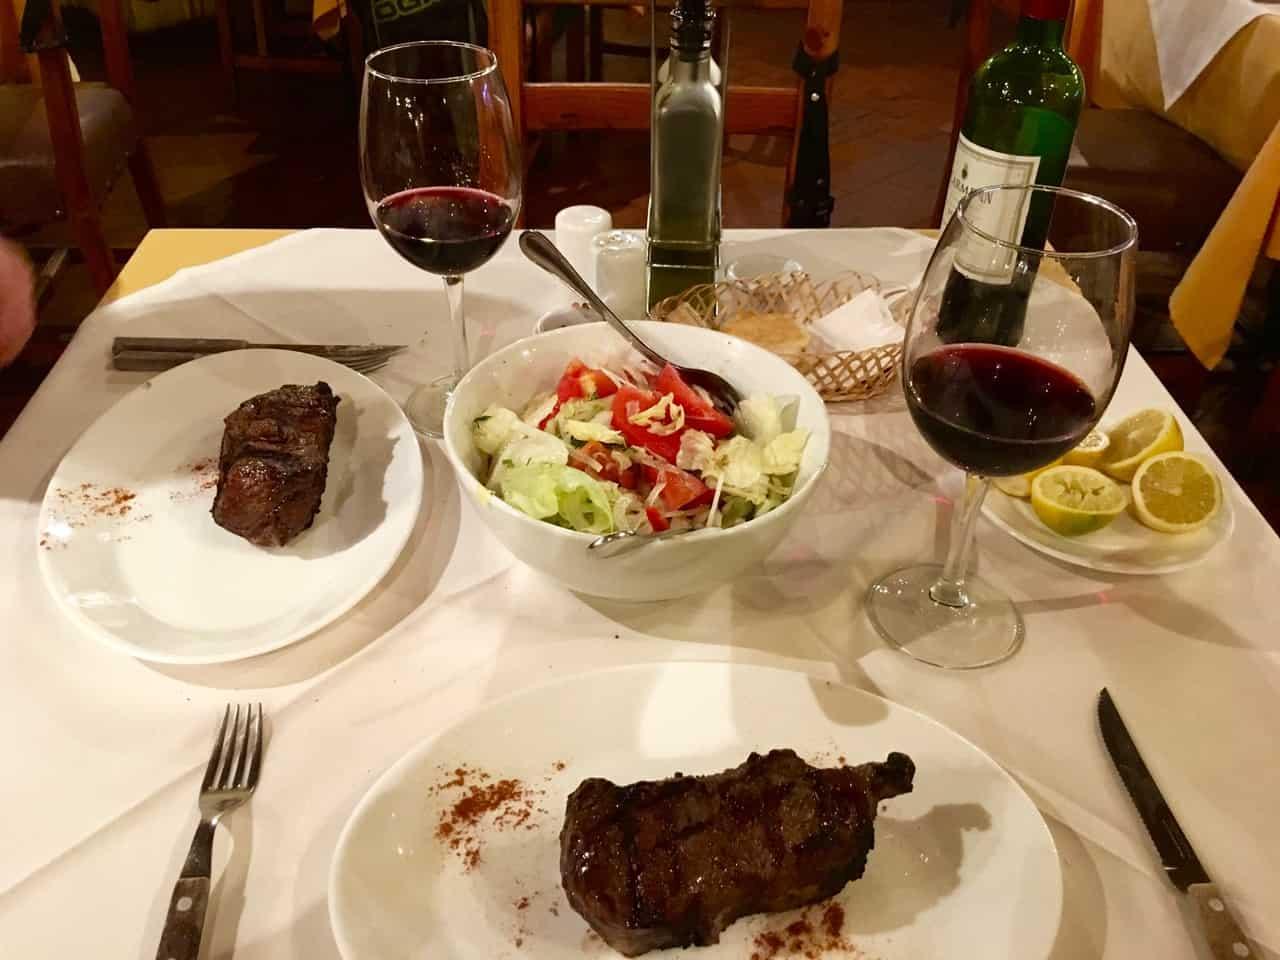 Things to do in Santiago - Steak and wine dinner at Las Vacas Gordas restaurant in Santiago